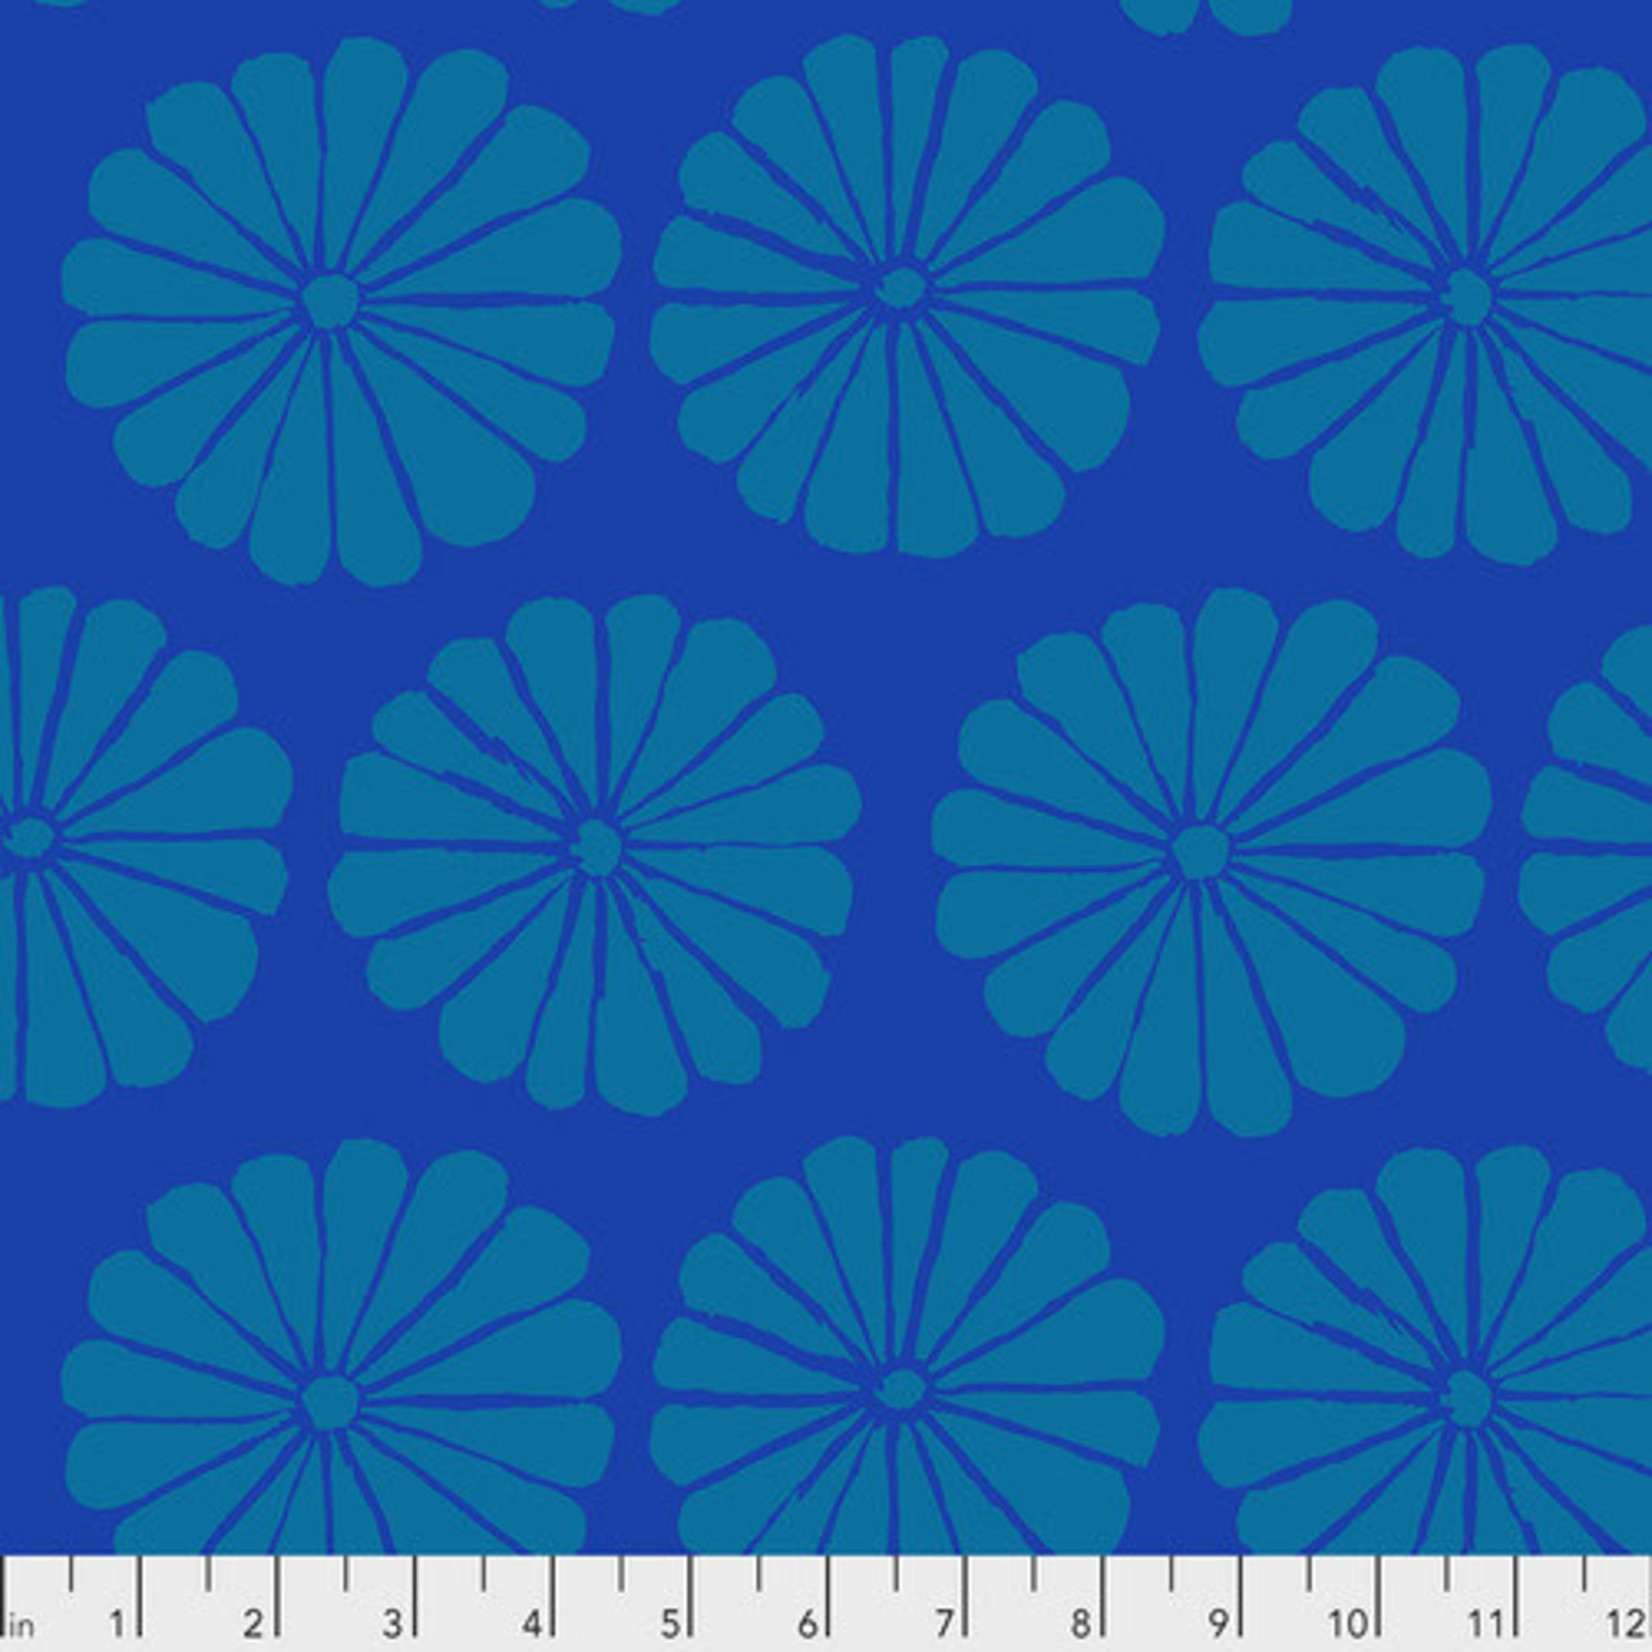 Kaffe Fassett KF Collective - Damask Flower, Blue (PWGP183.BLUE) $0.18 per cm or $18/m